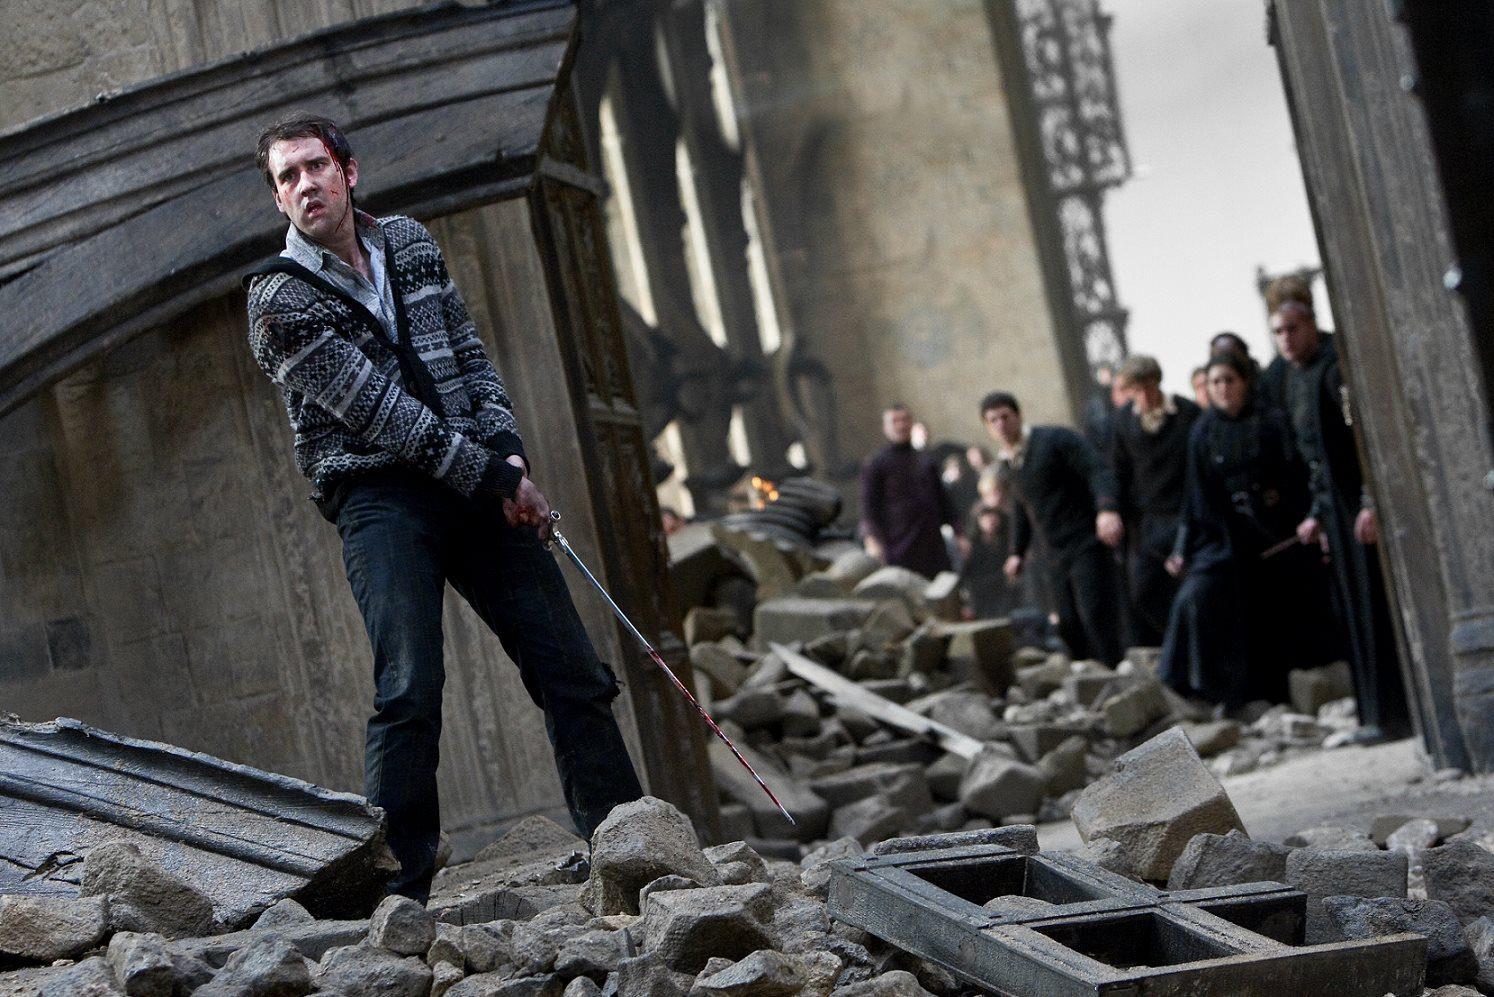 Best Harry Potter Movie - Deathly Hallows Part 2